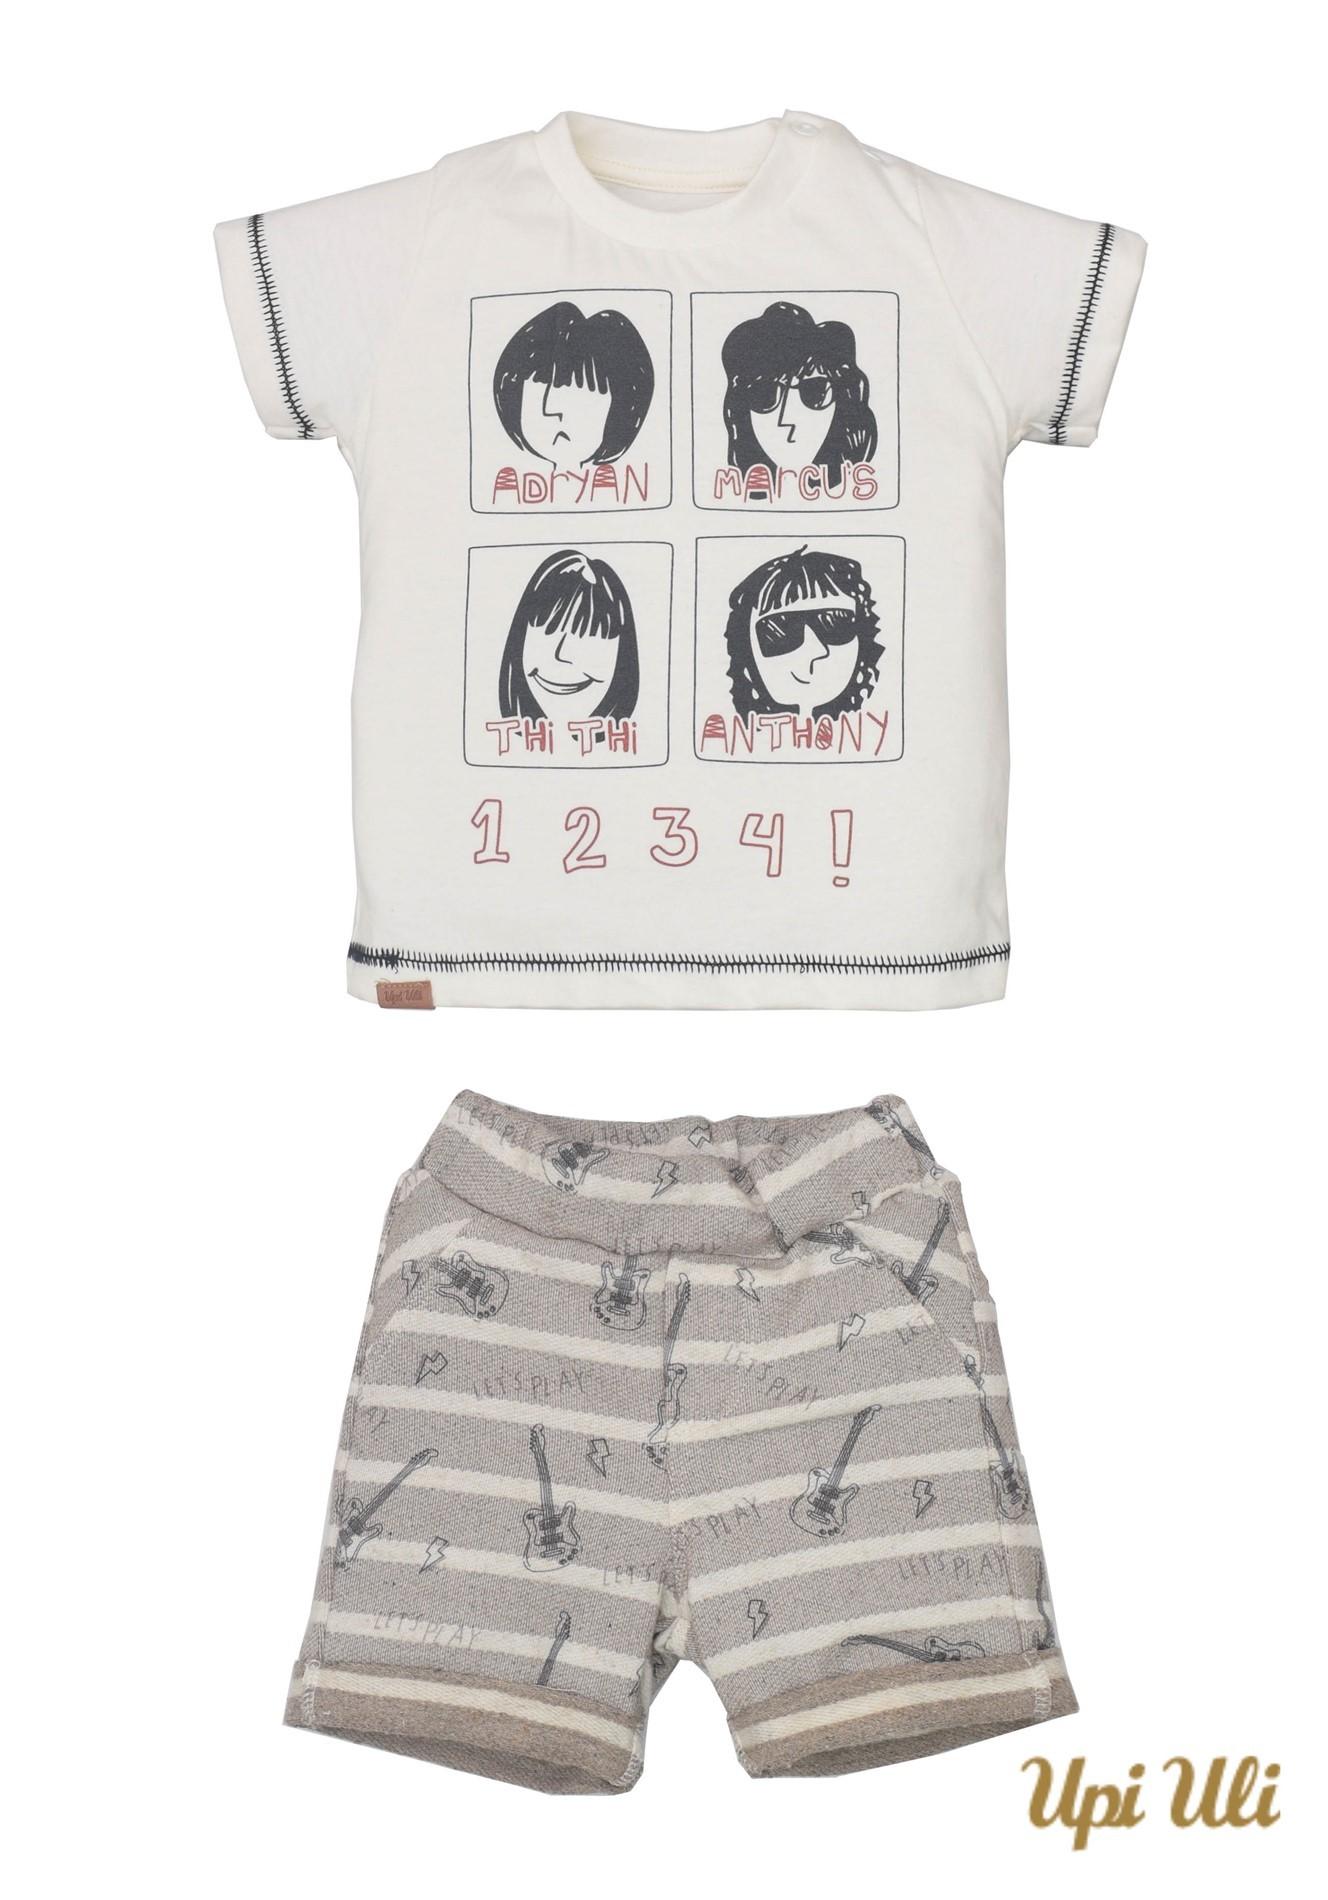 Conj. T-Shirt Meia Malha/Moletinho Bryan